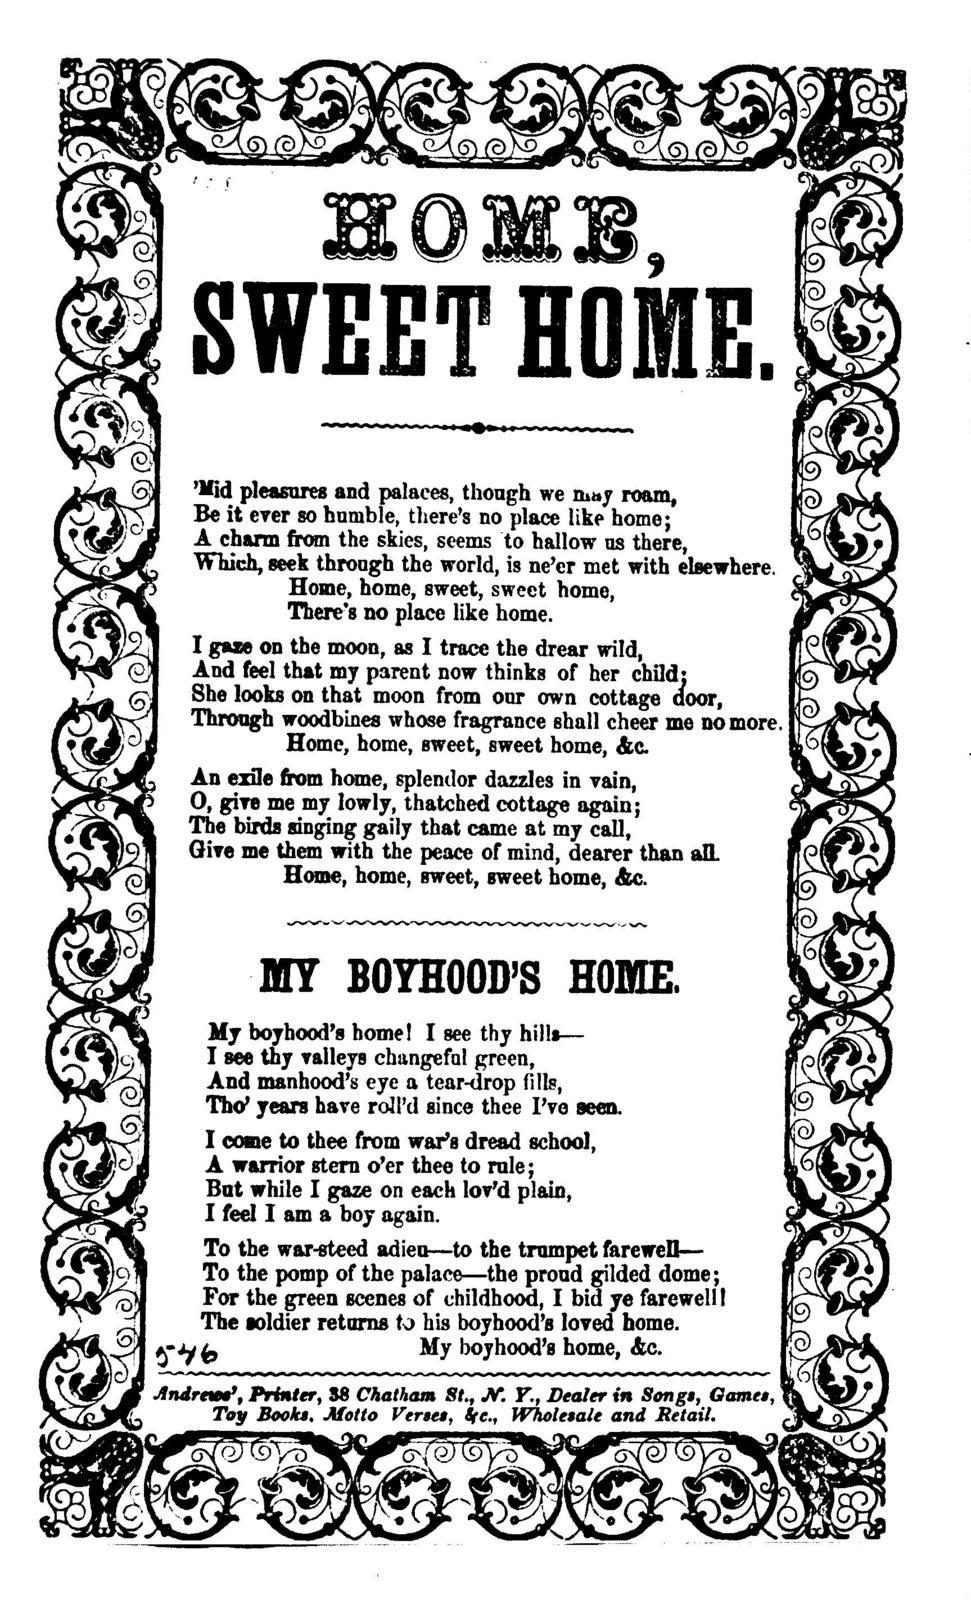 Home, sweet home. Andrews', Printer, 38 Chatham St., N.Y